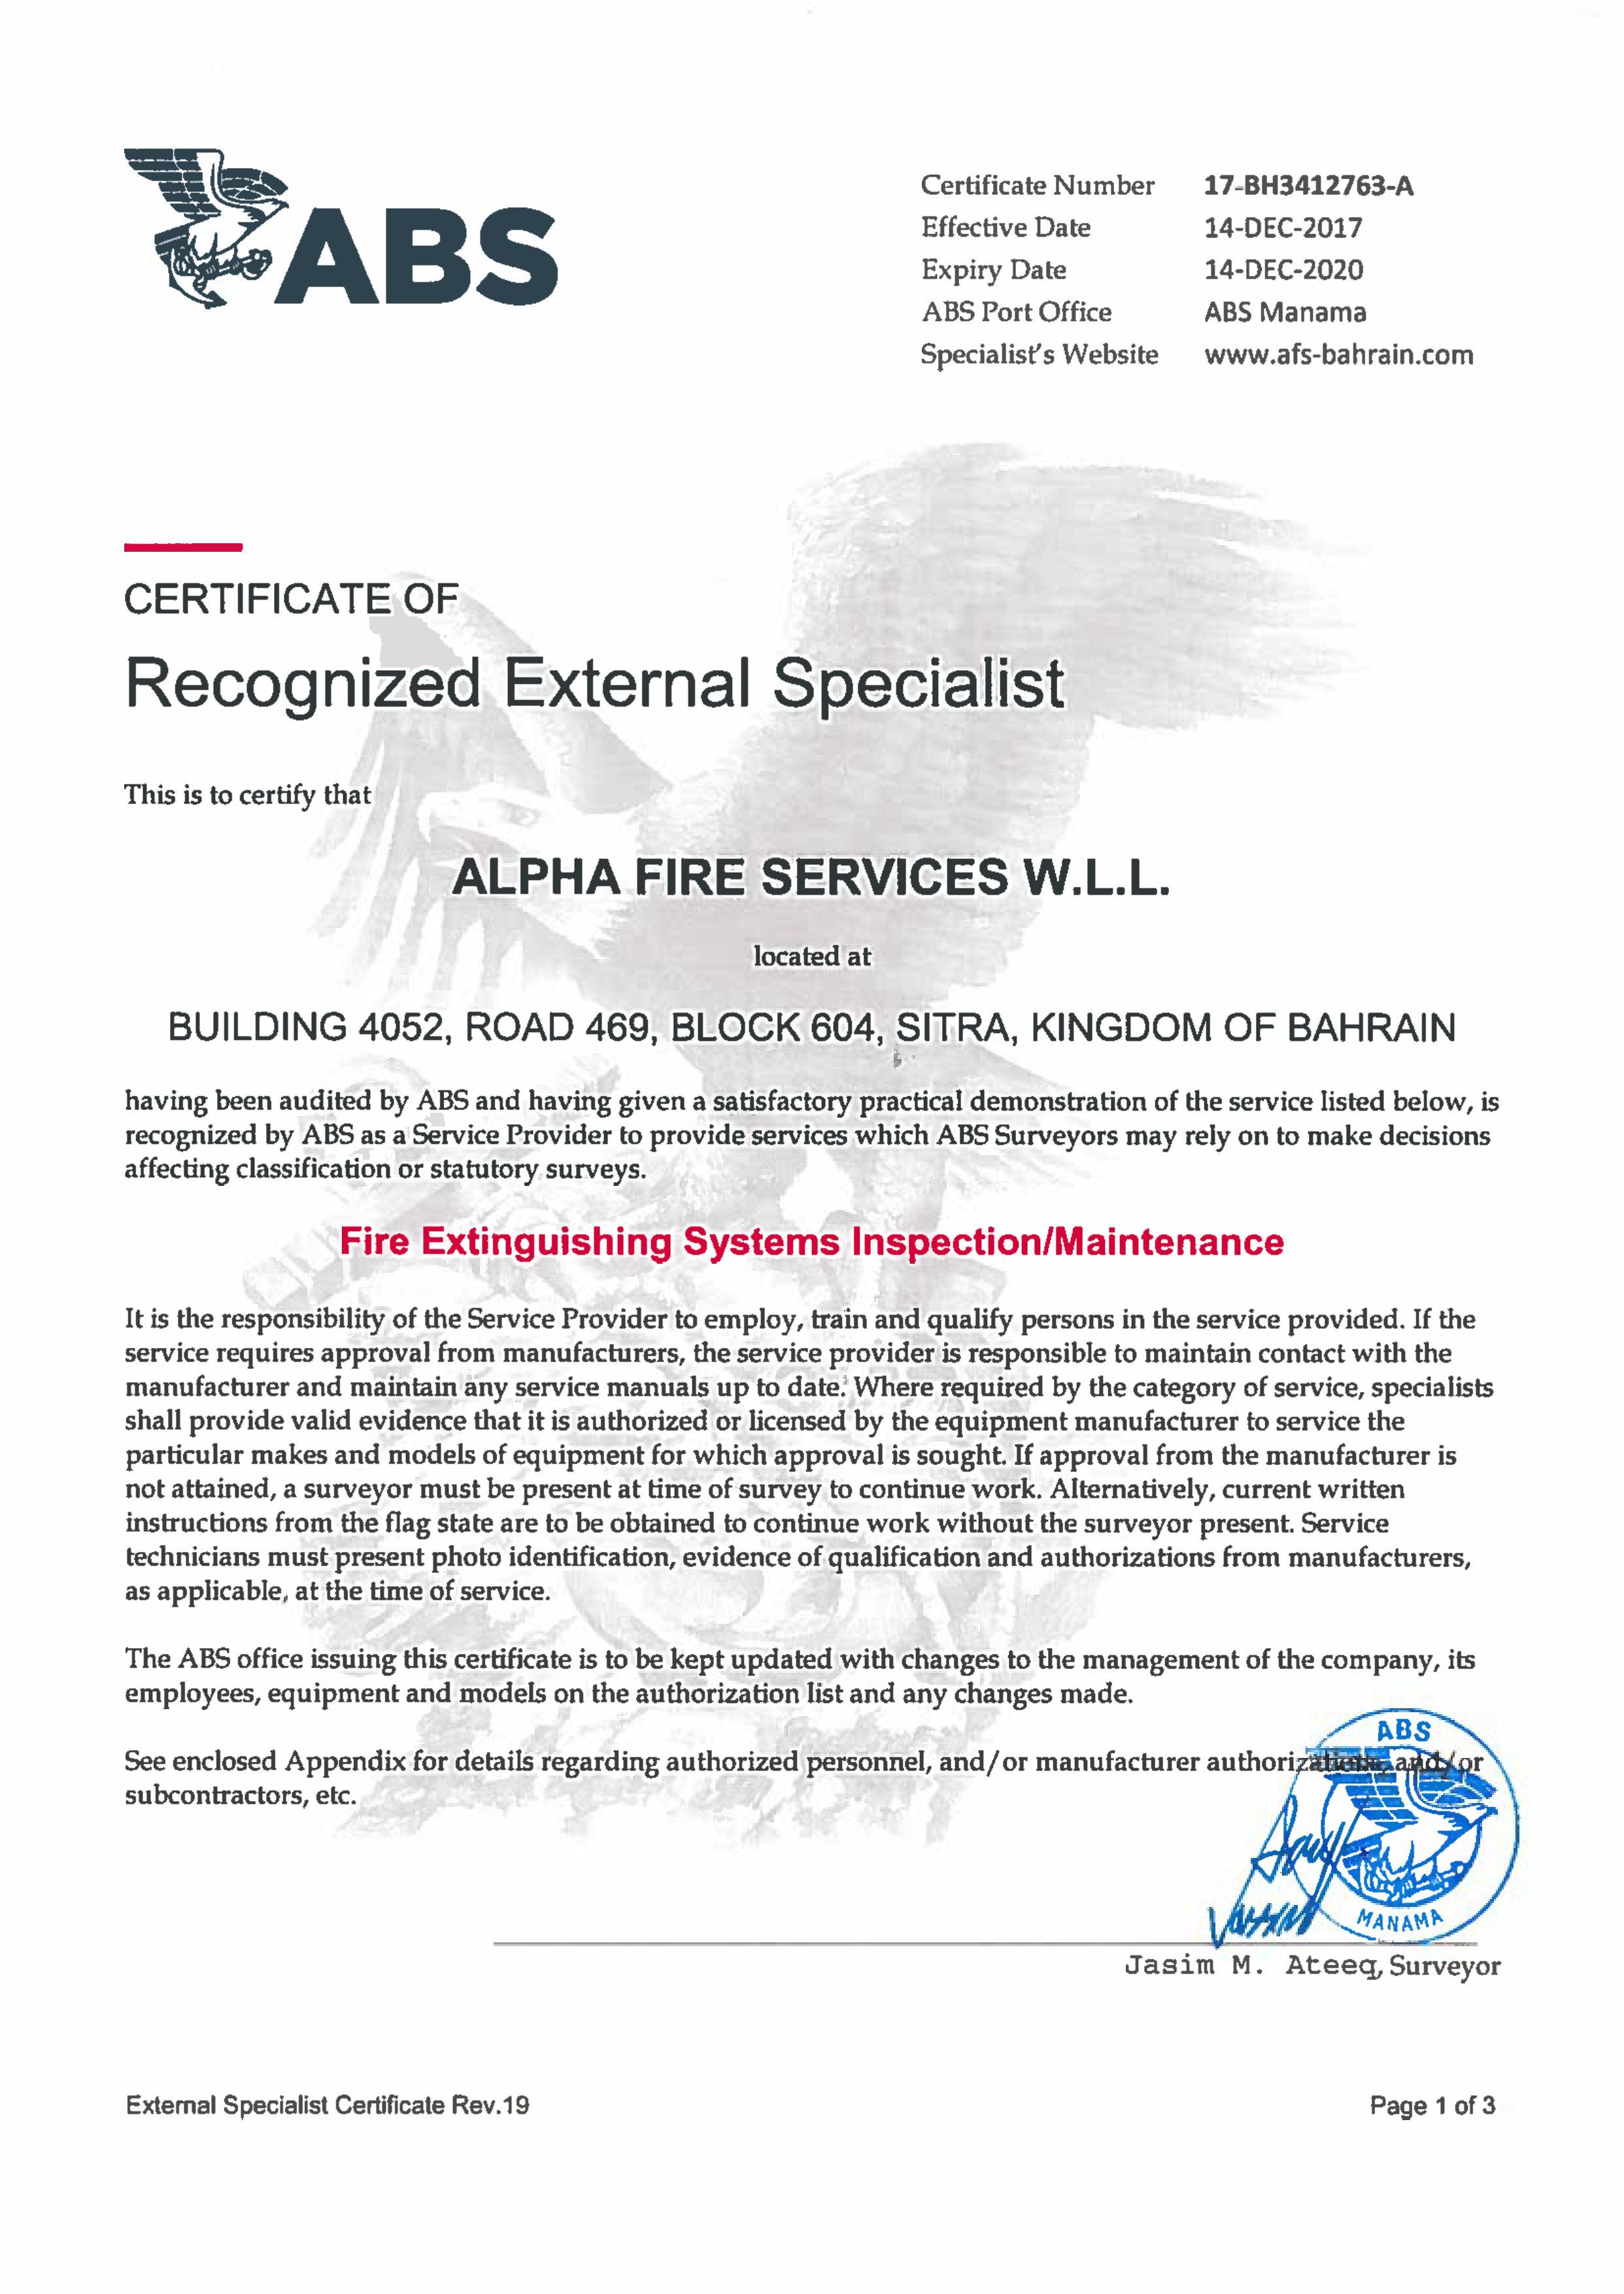 Alpha Fire Services